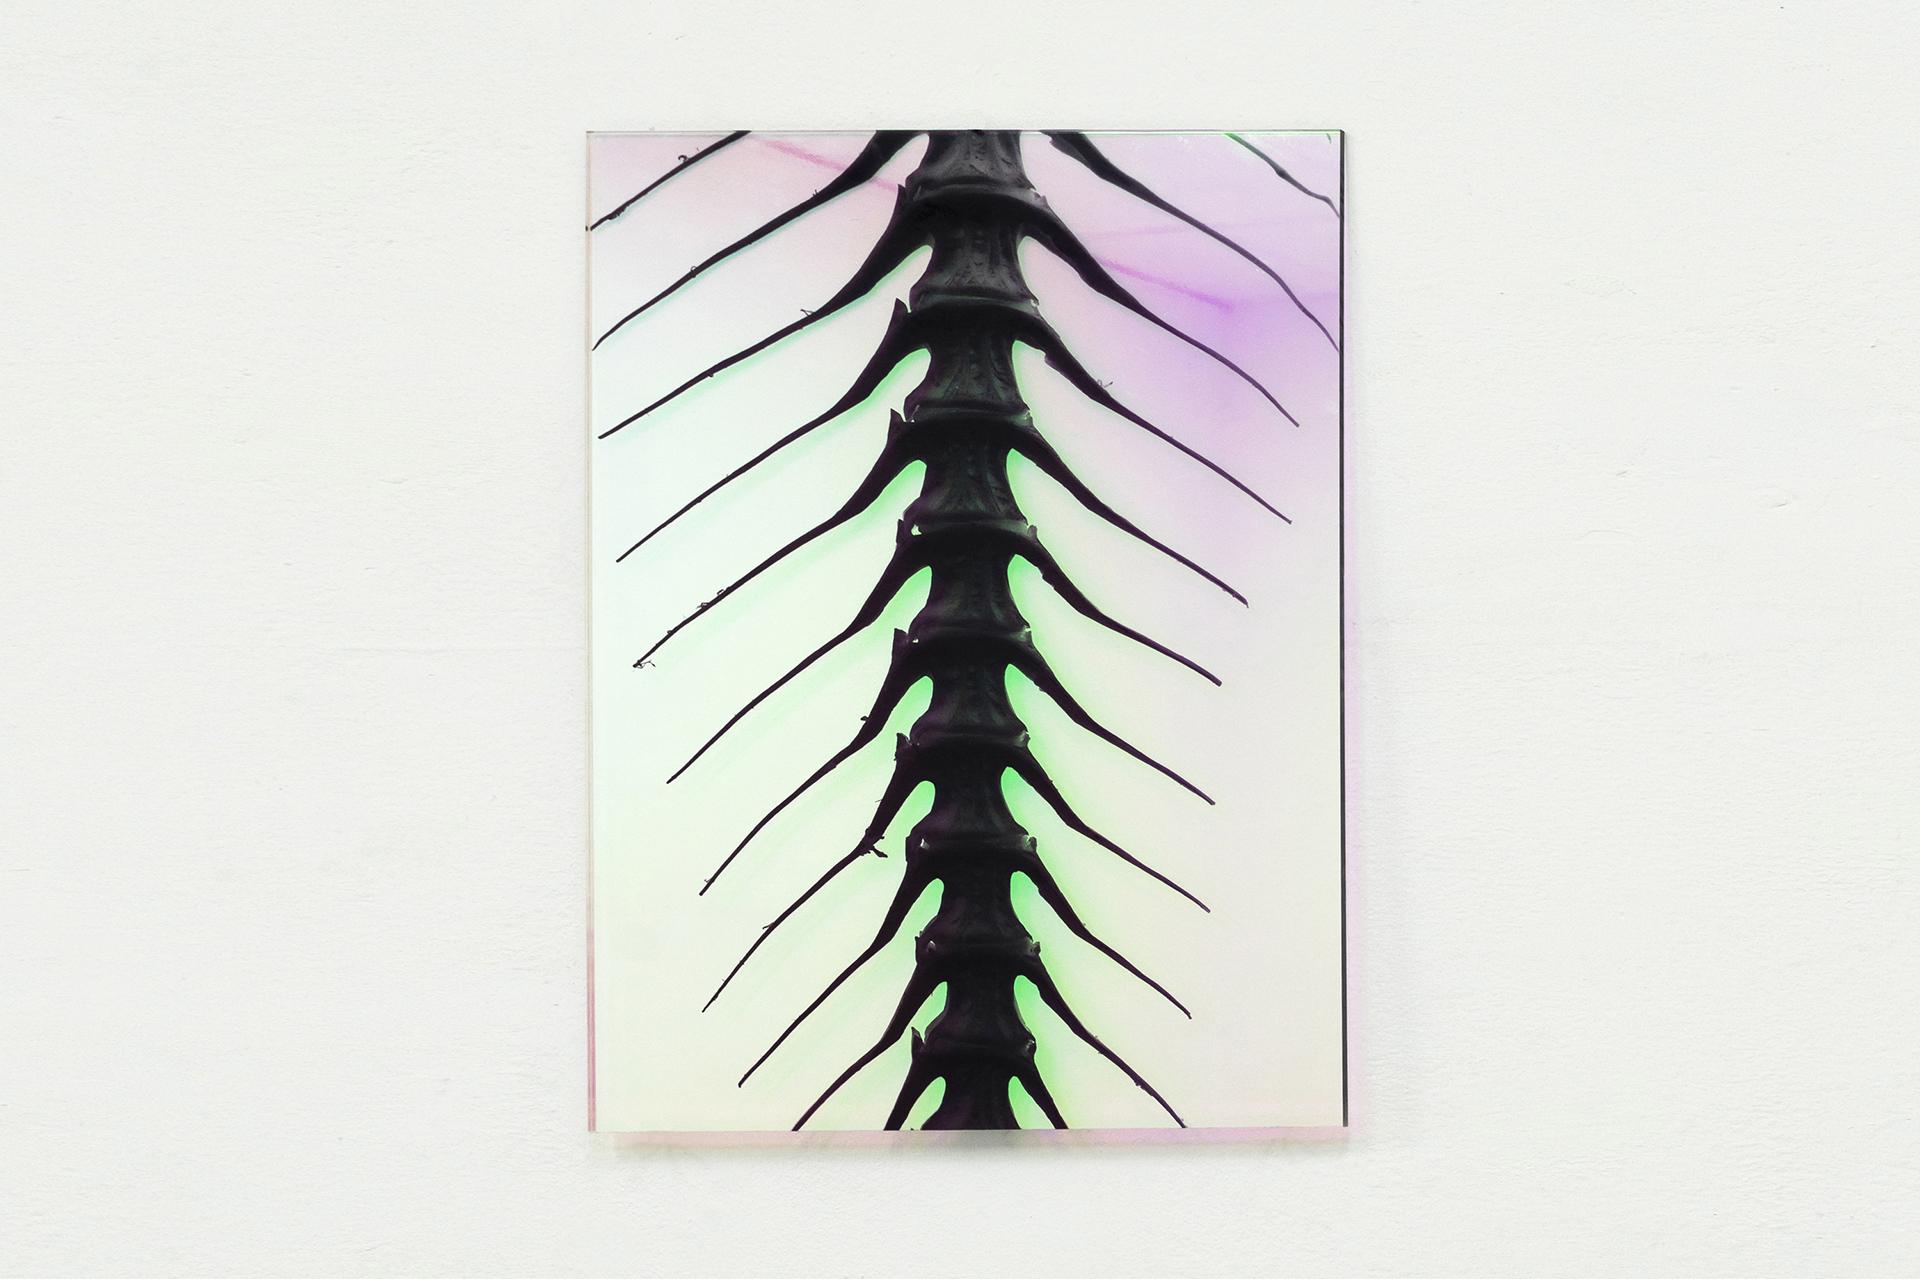 24-Paulo-Arraiano,-Sensorial-Divinities.-2019.-Exhibition-view.-Dimora-Artica-(ph-Cesare-Lopopolo).jpg